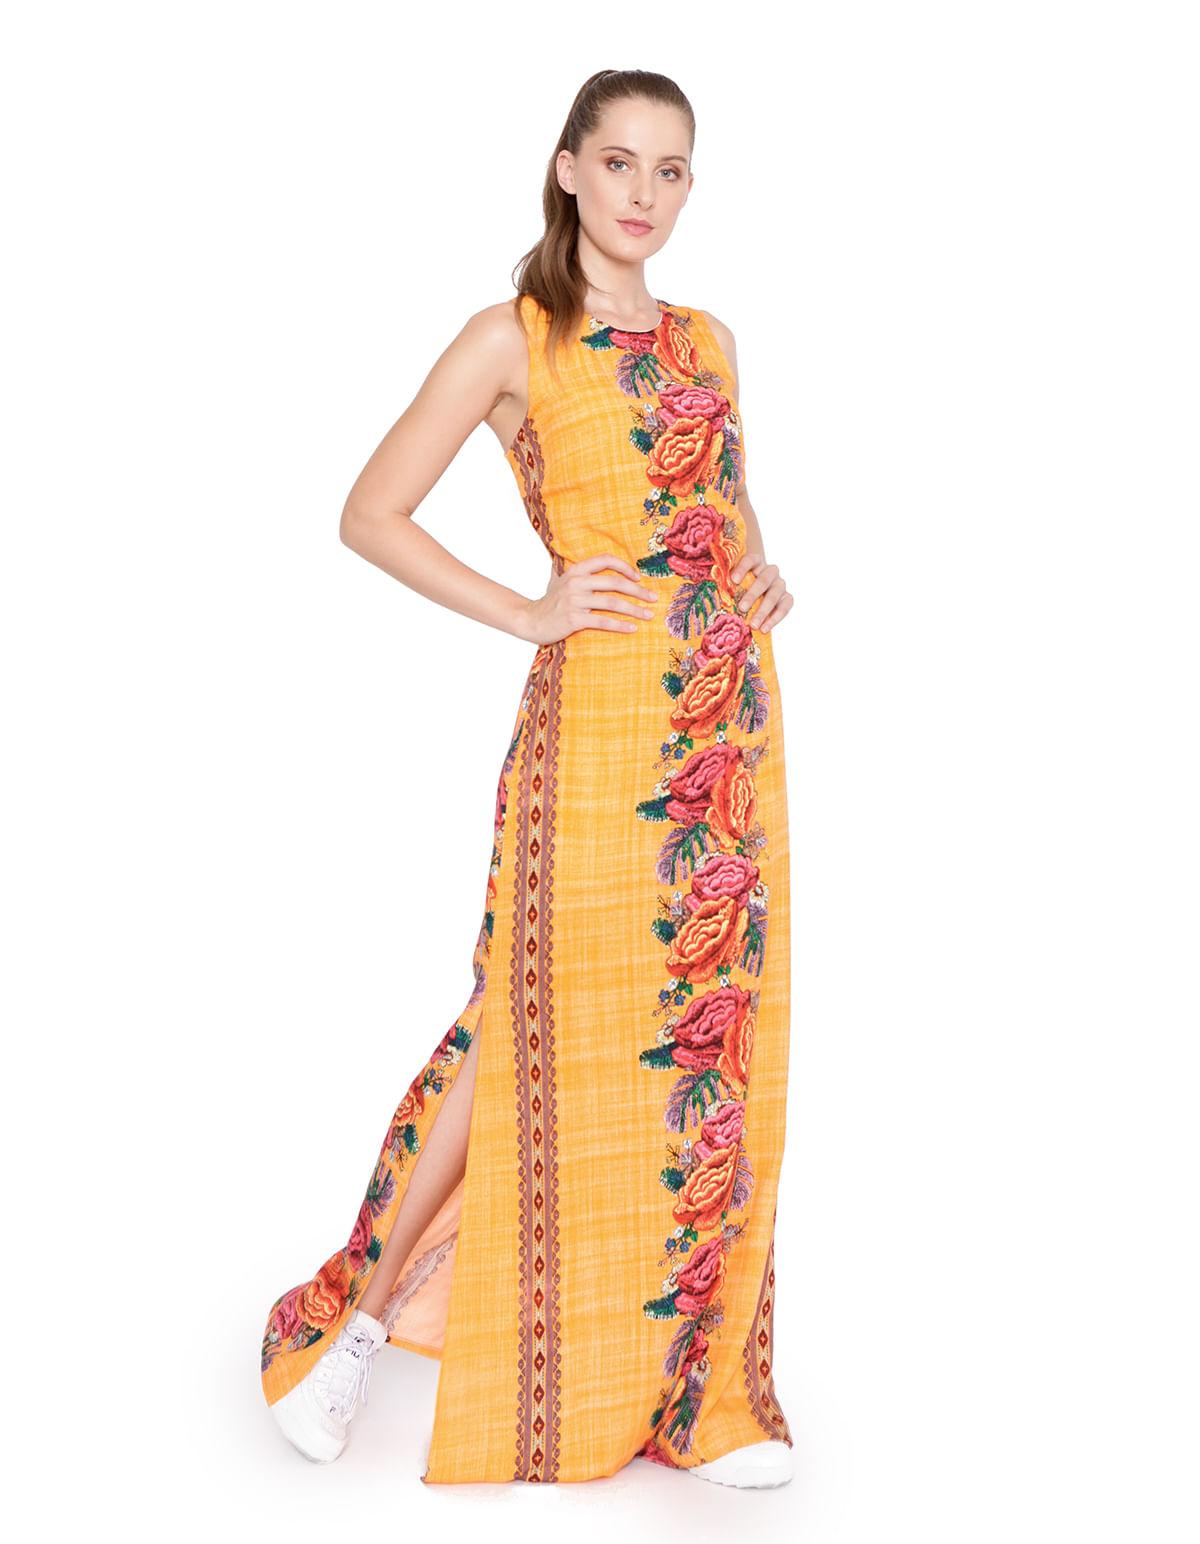 443a7ea34 Vestido longo alca larga laranja/vinho - LucyintheSky